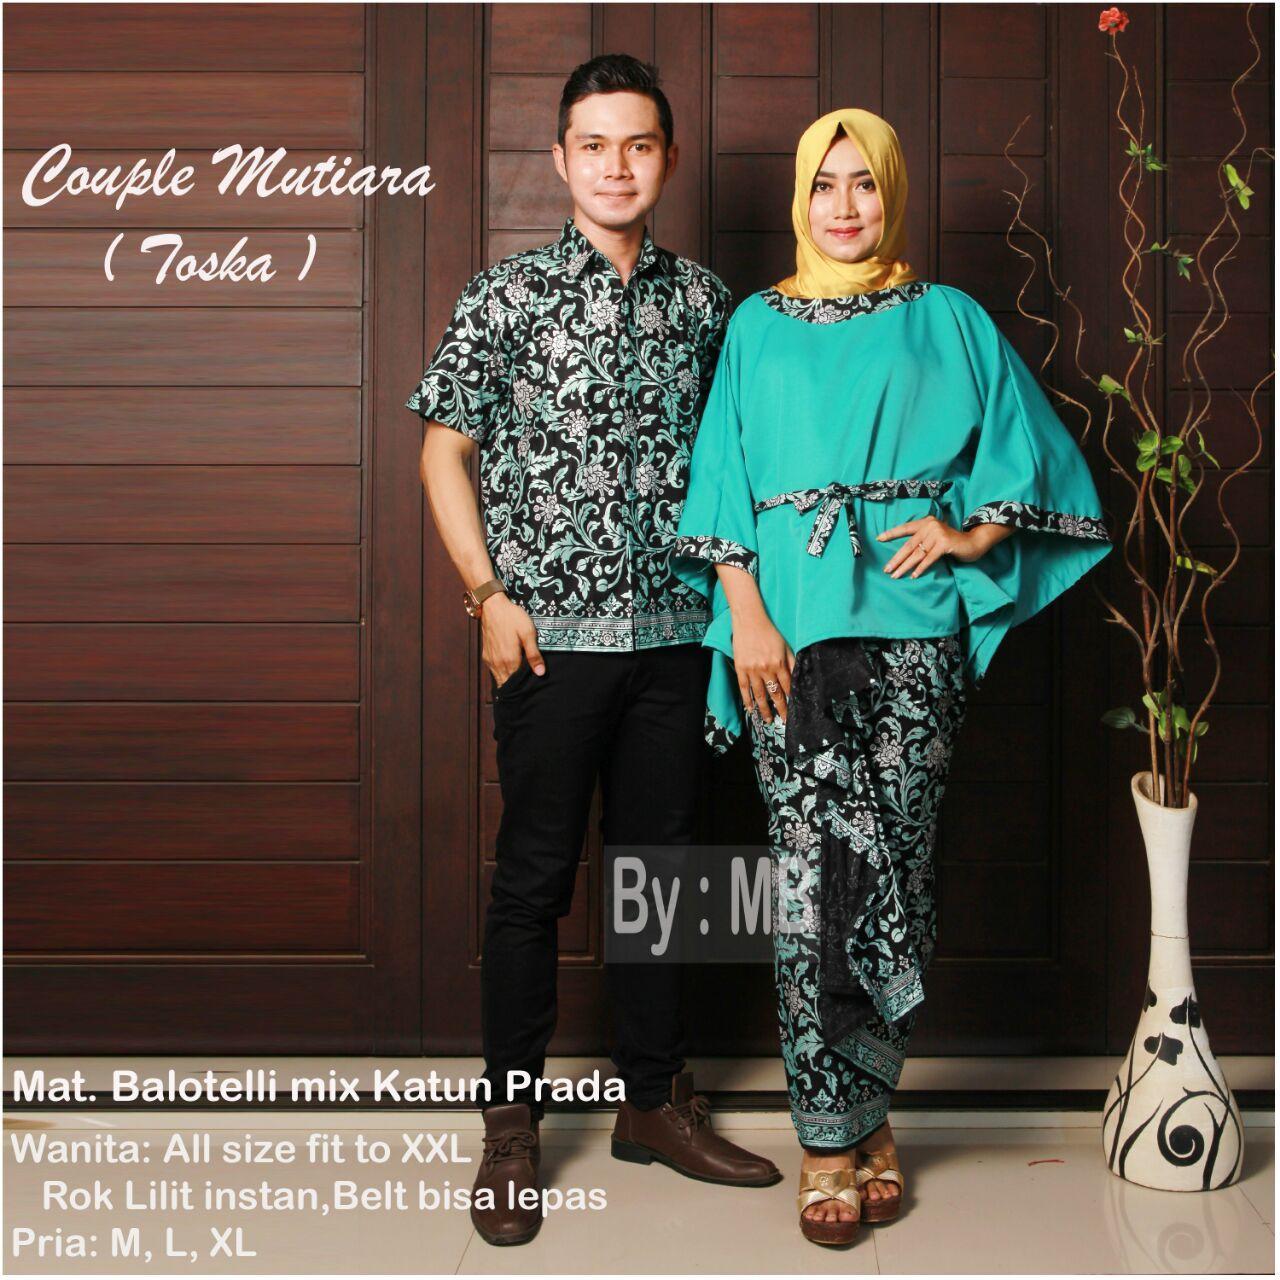 TERMURAH - Batik Couple / Batik sarimbit / Batik / Batik keluarga / Batik Modern / Couple Batik rabbani